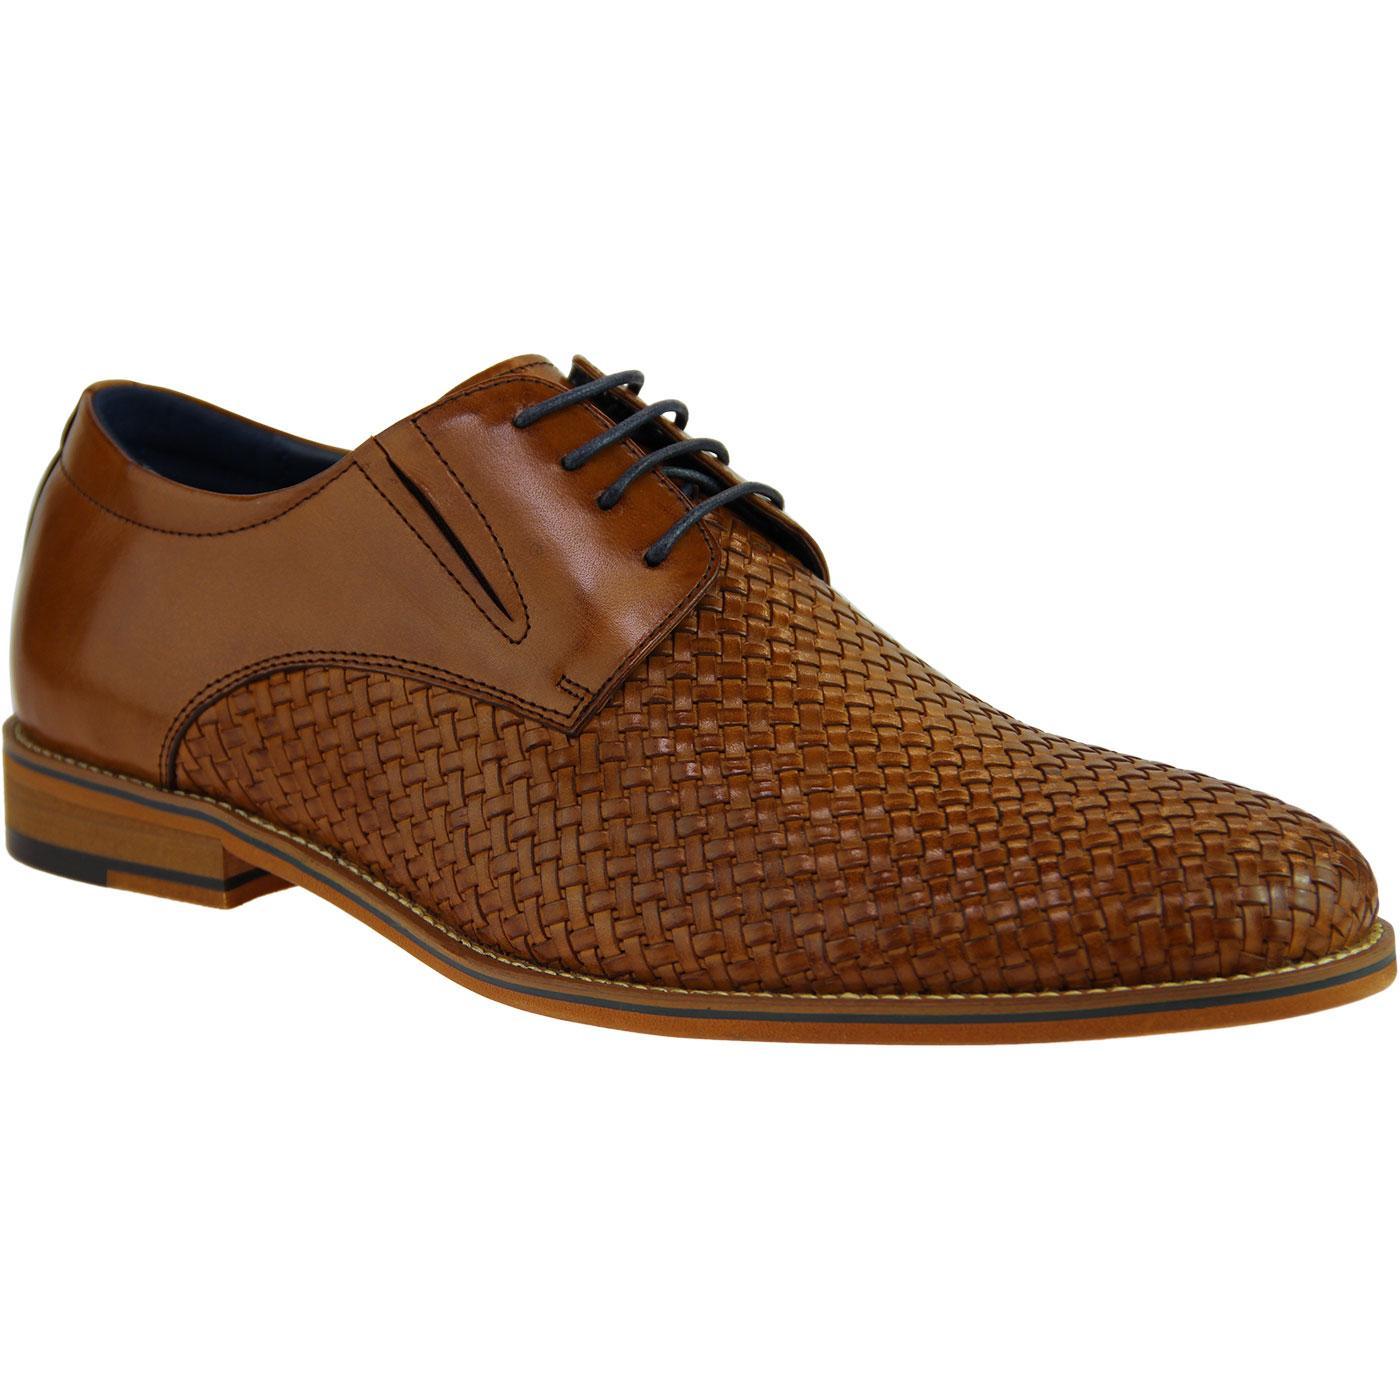 Toni SERGIO DULETTI Basket Weave Derby Shoes BROWN